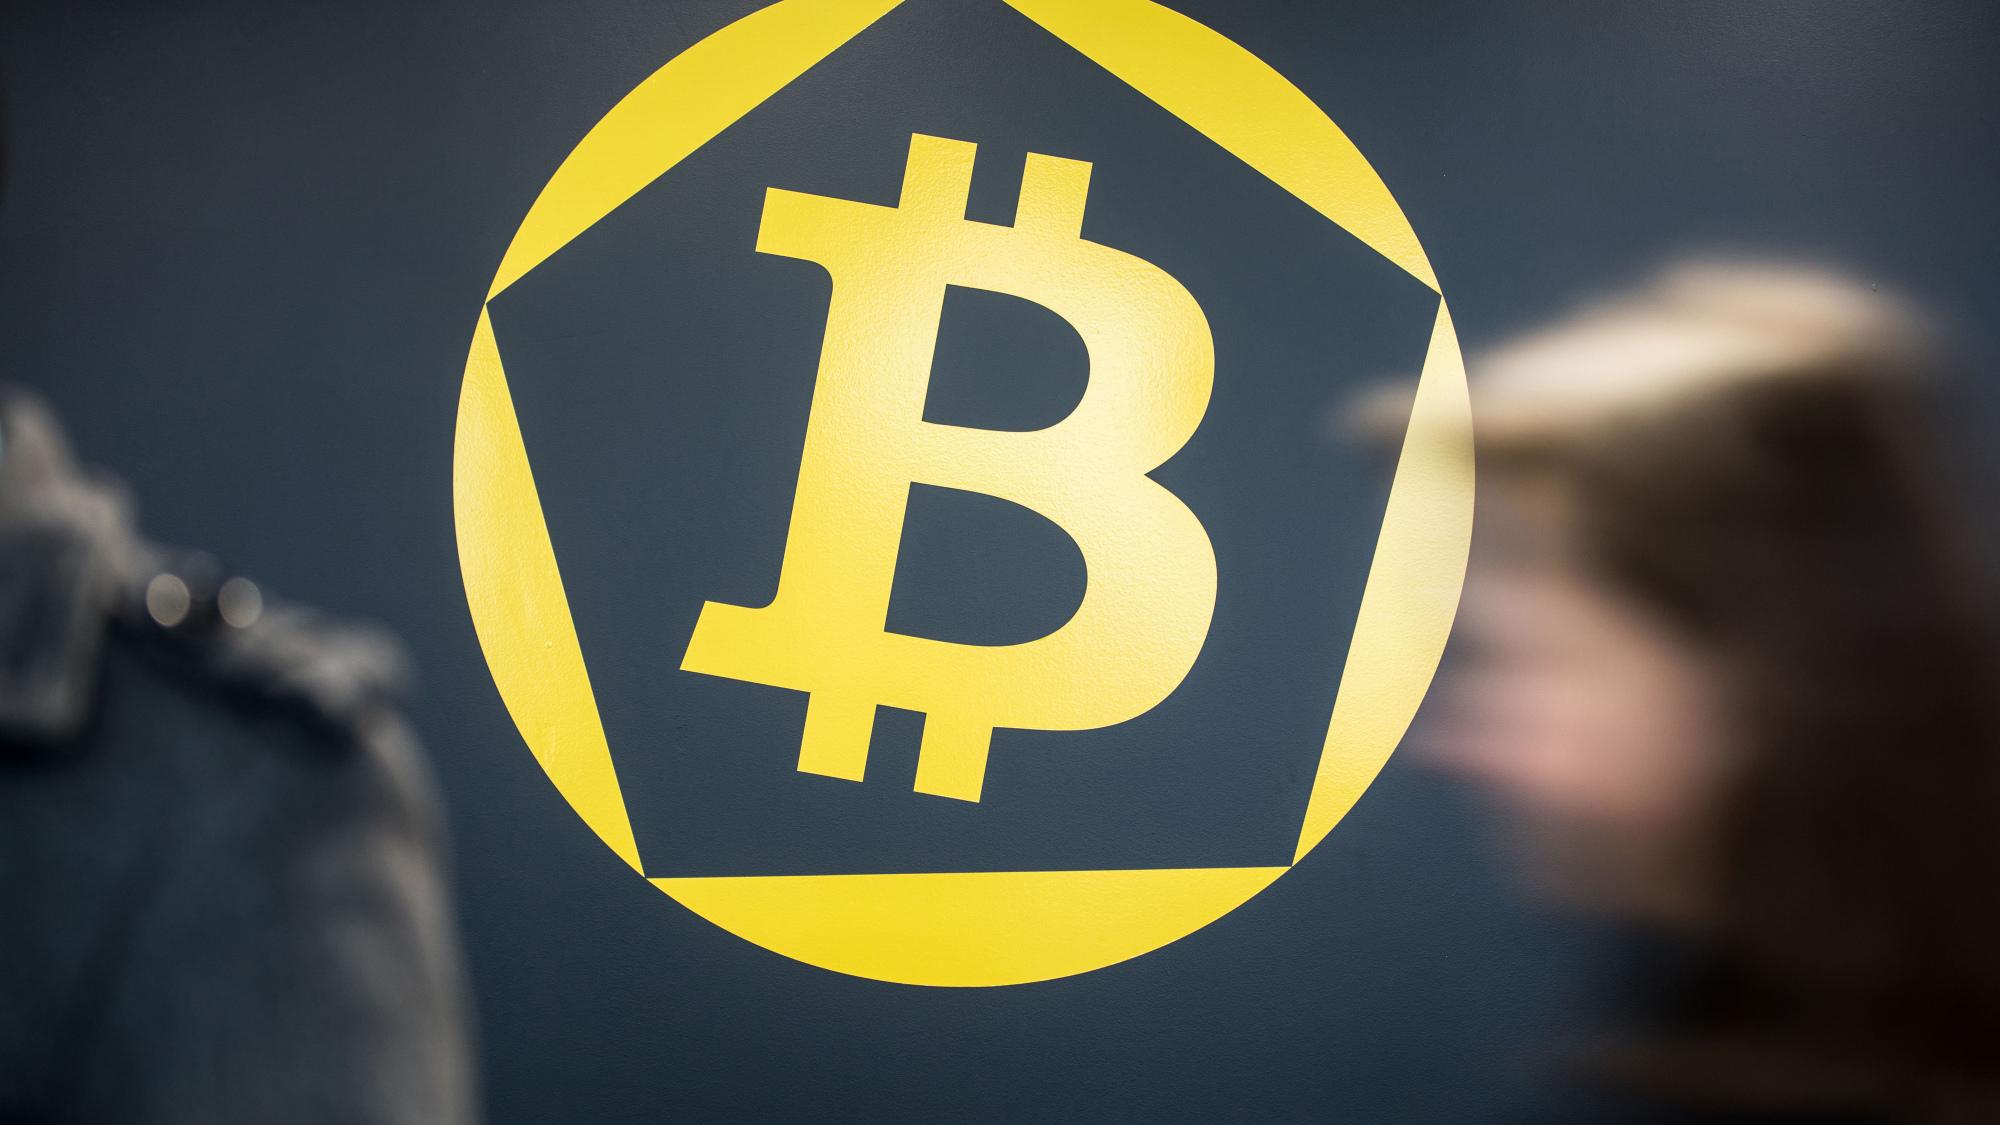 Bitcoin futures will trade on cme cboe bloomberg biocorpaavc Choice Image